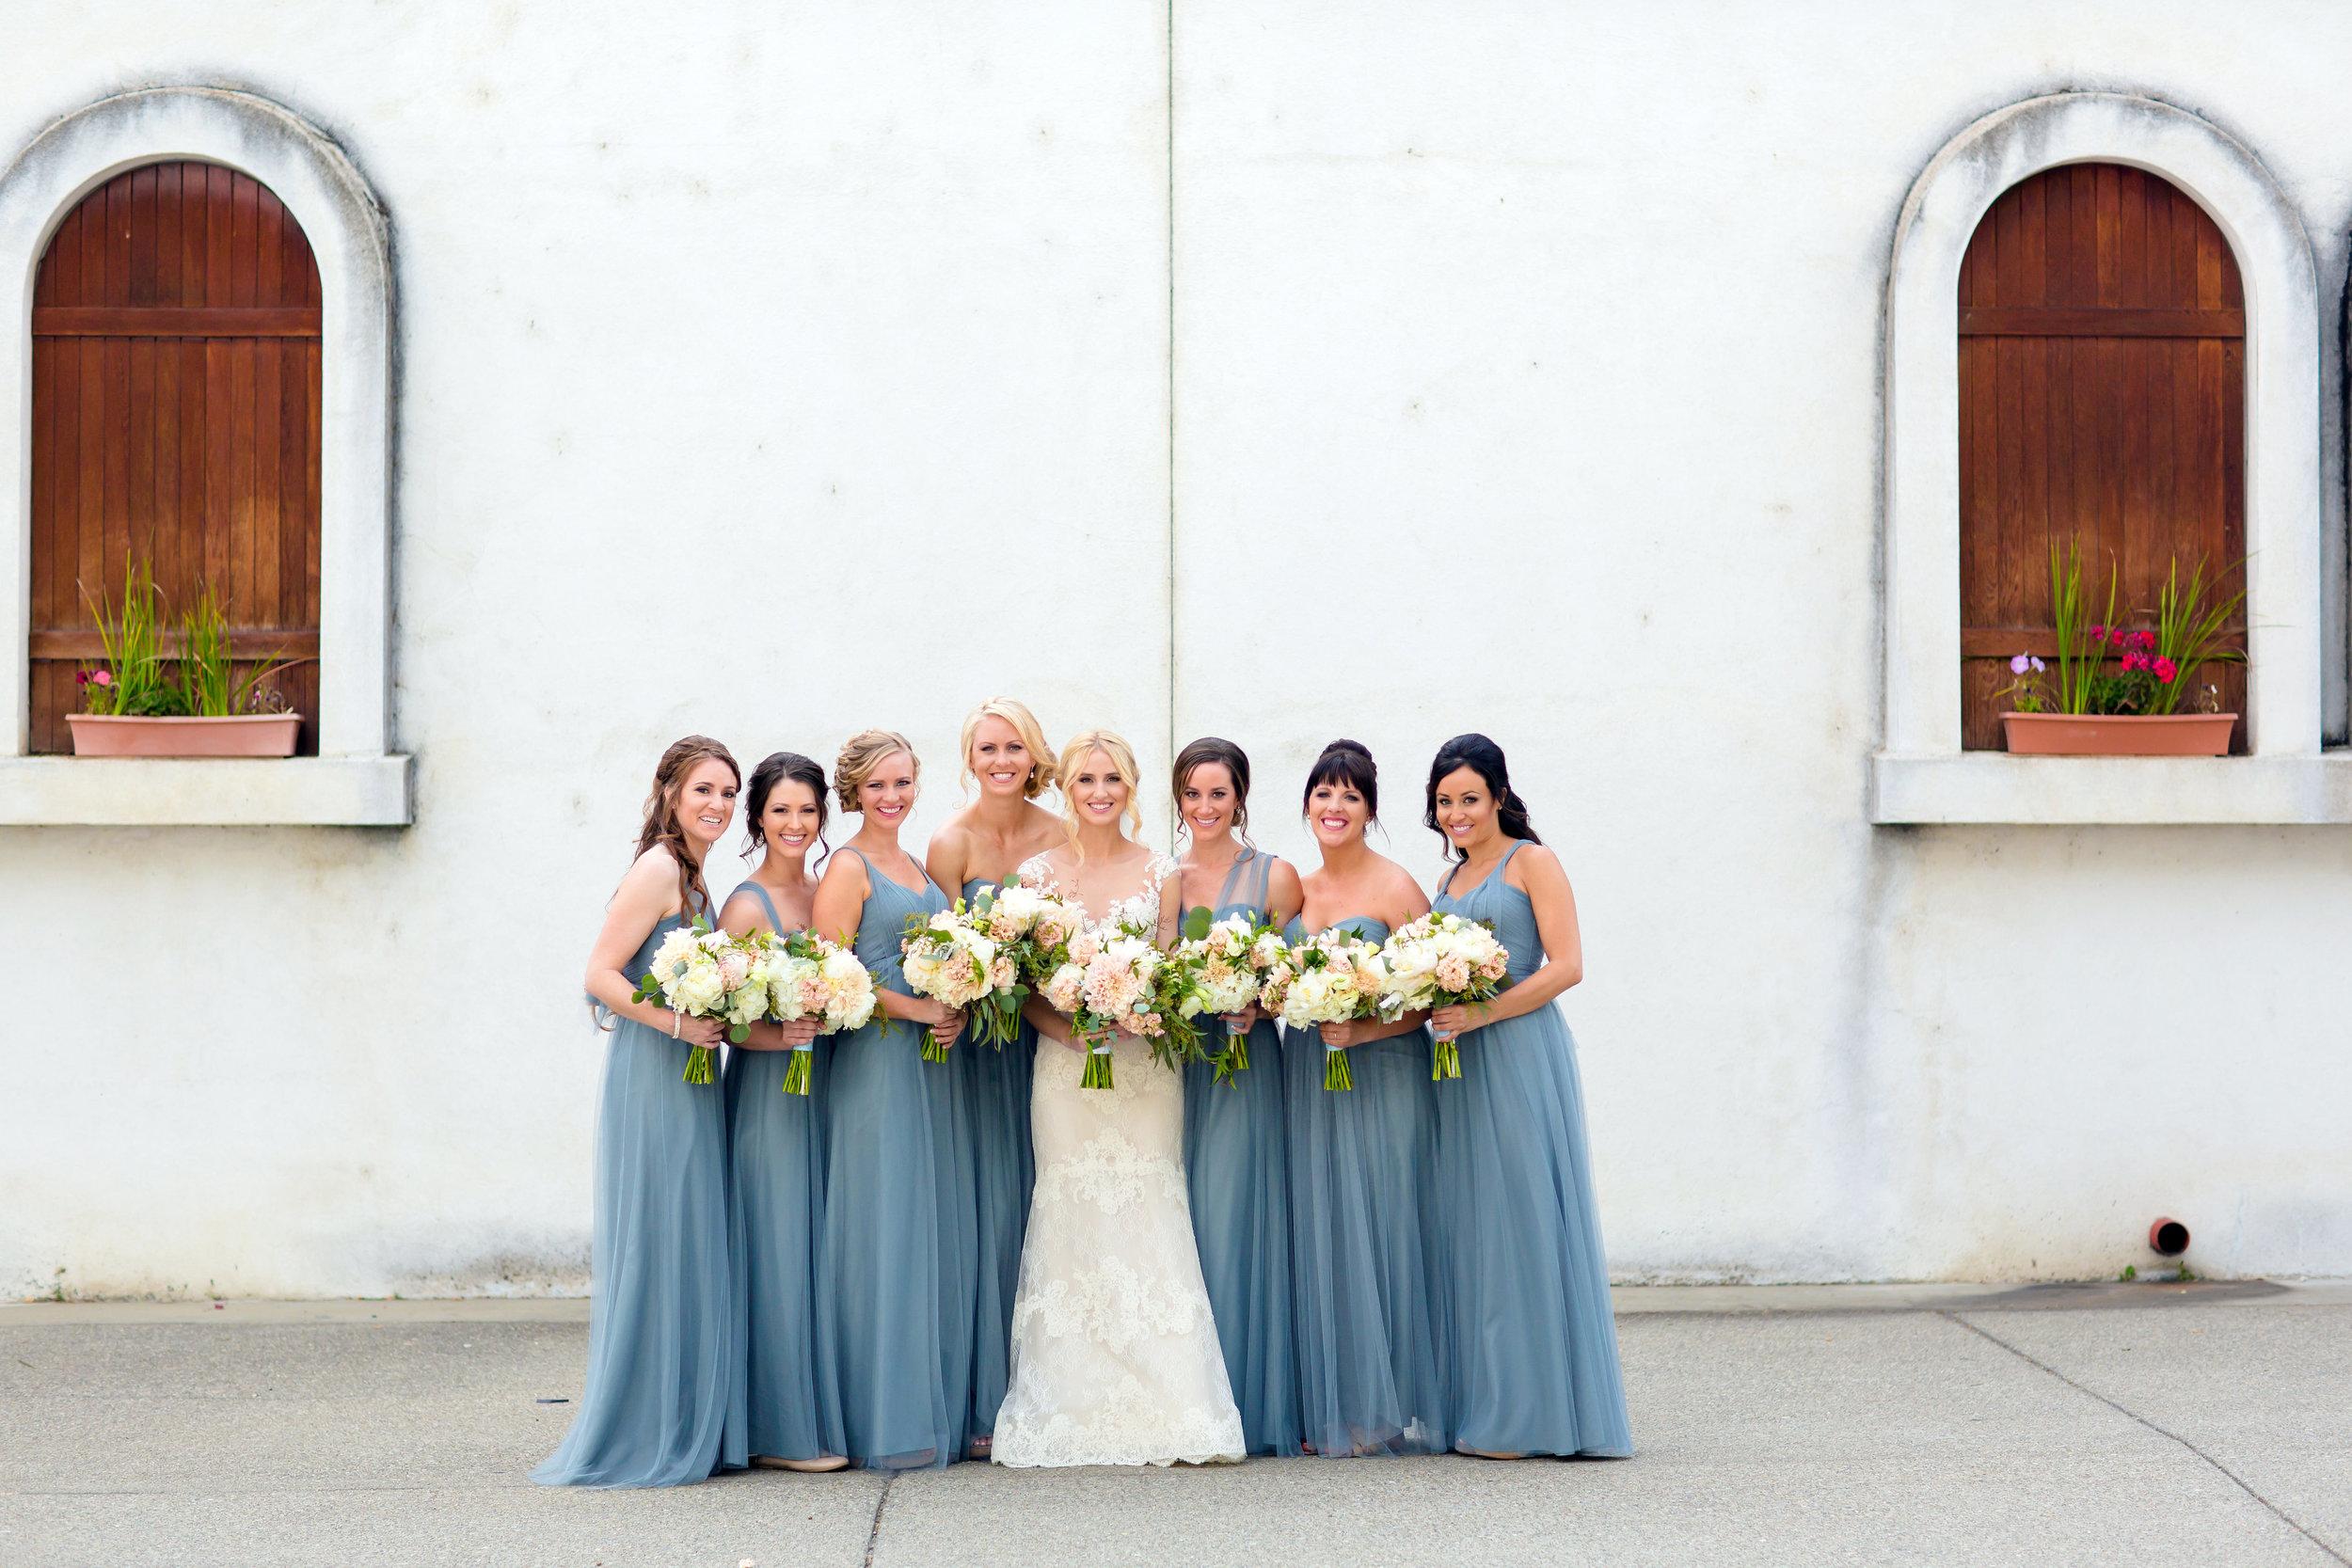 Bridal-Party-002.jpg